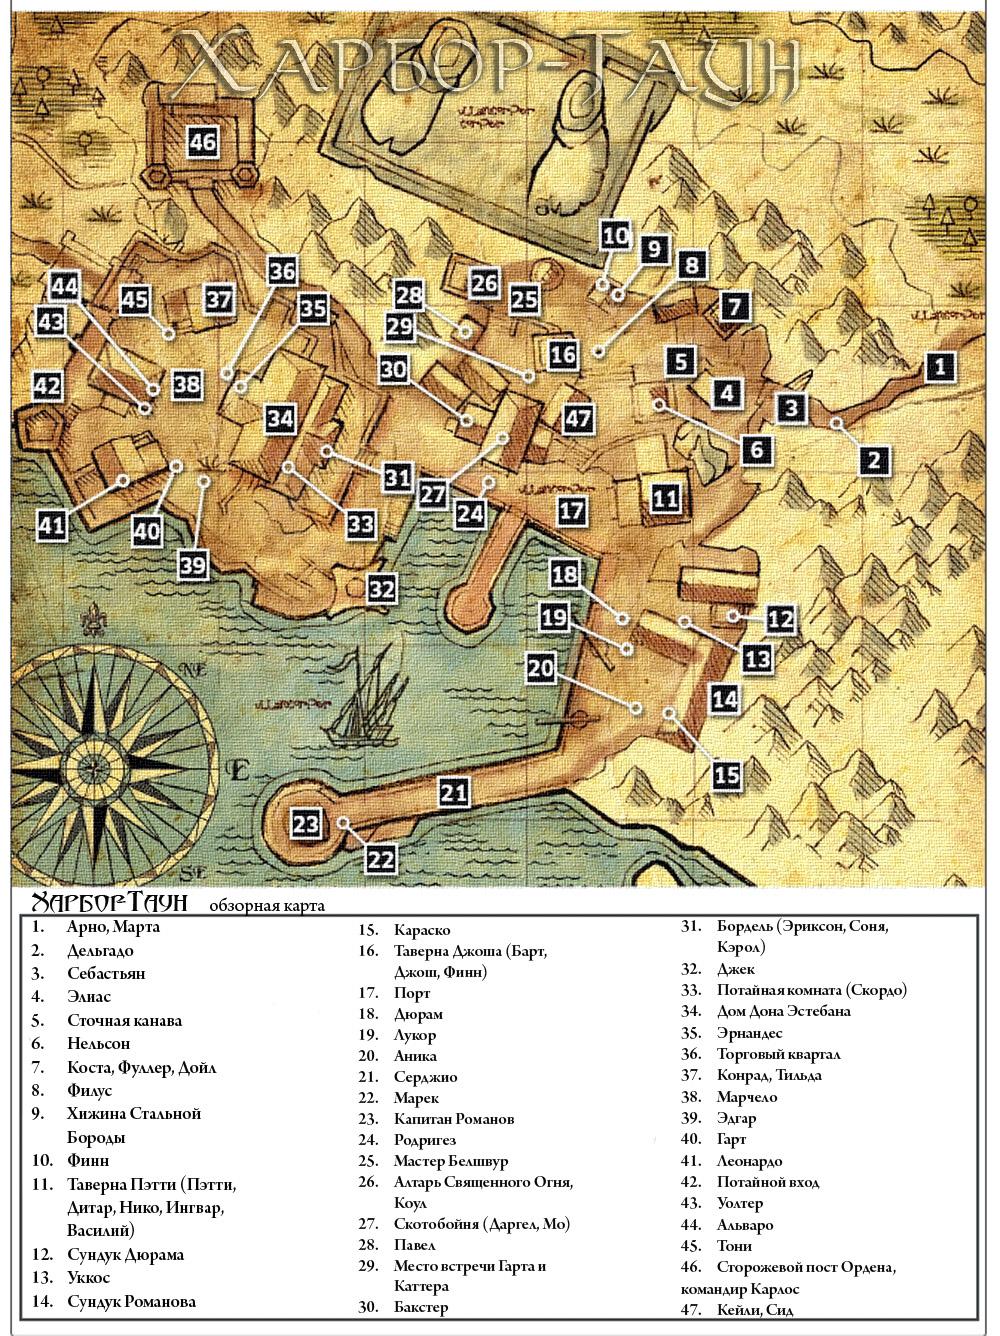 Рисен карты Harbor-Town